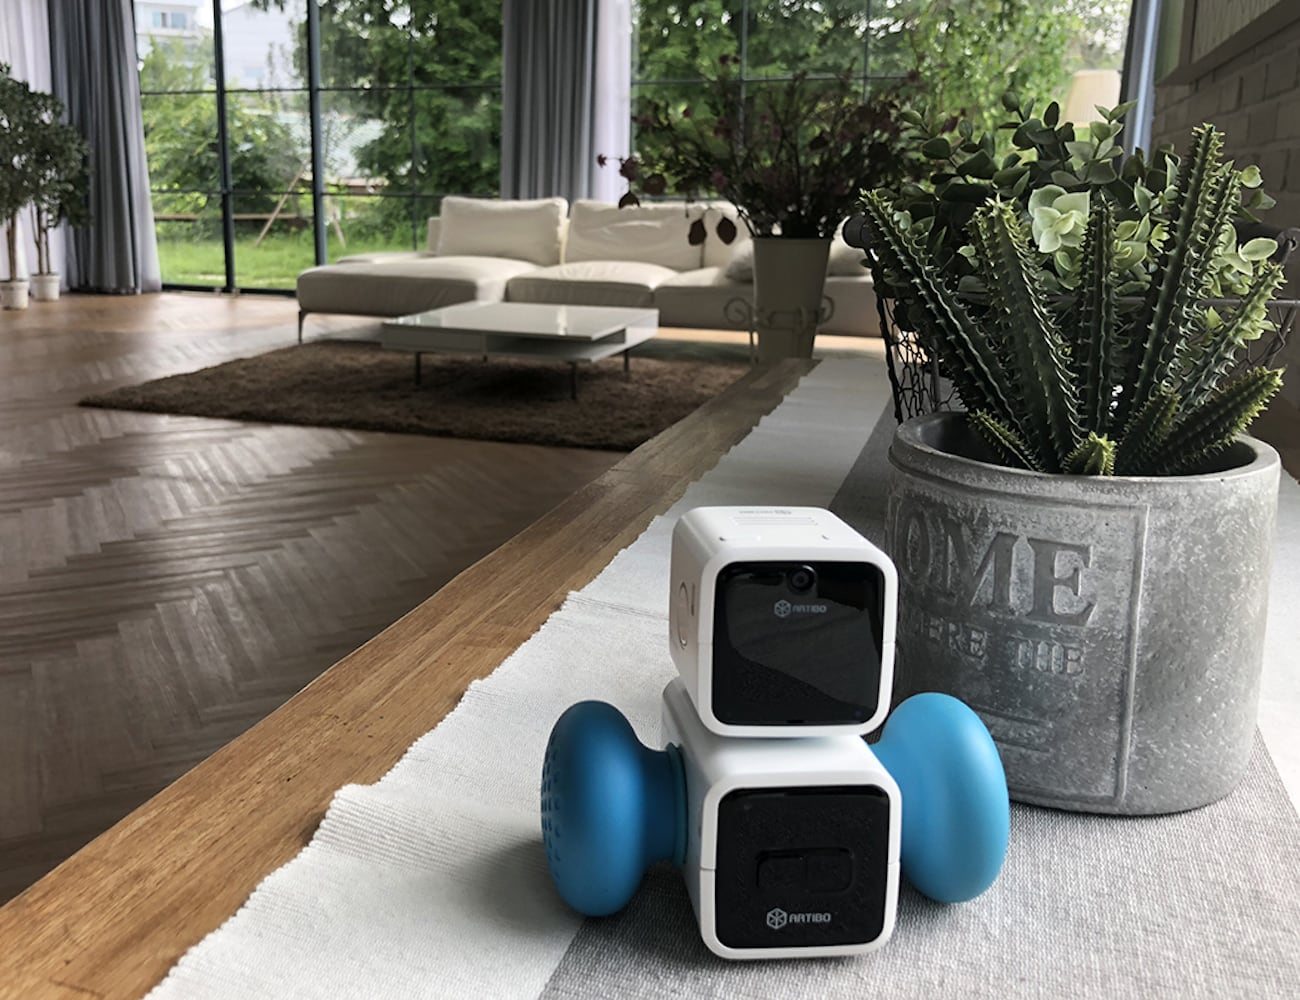 Cubroid Artibo Educational Companion Robot